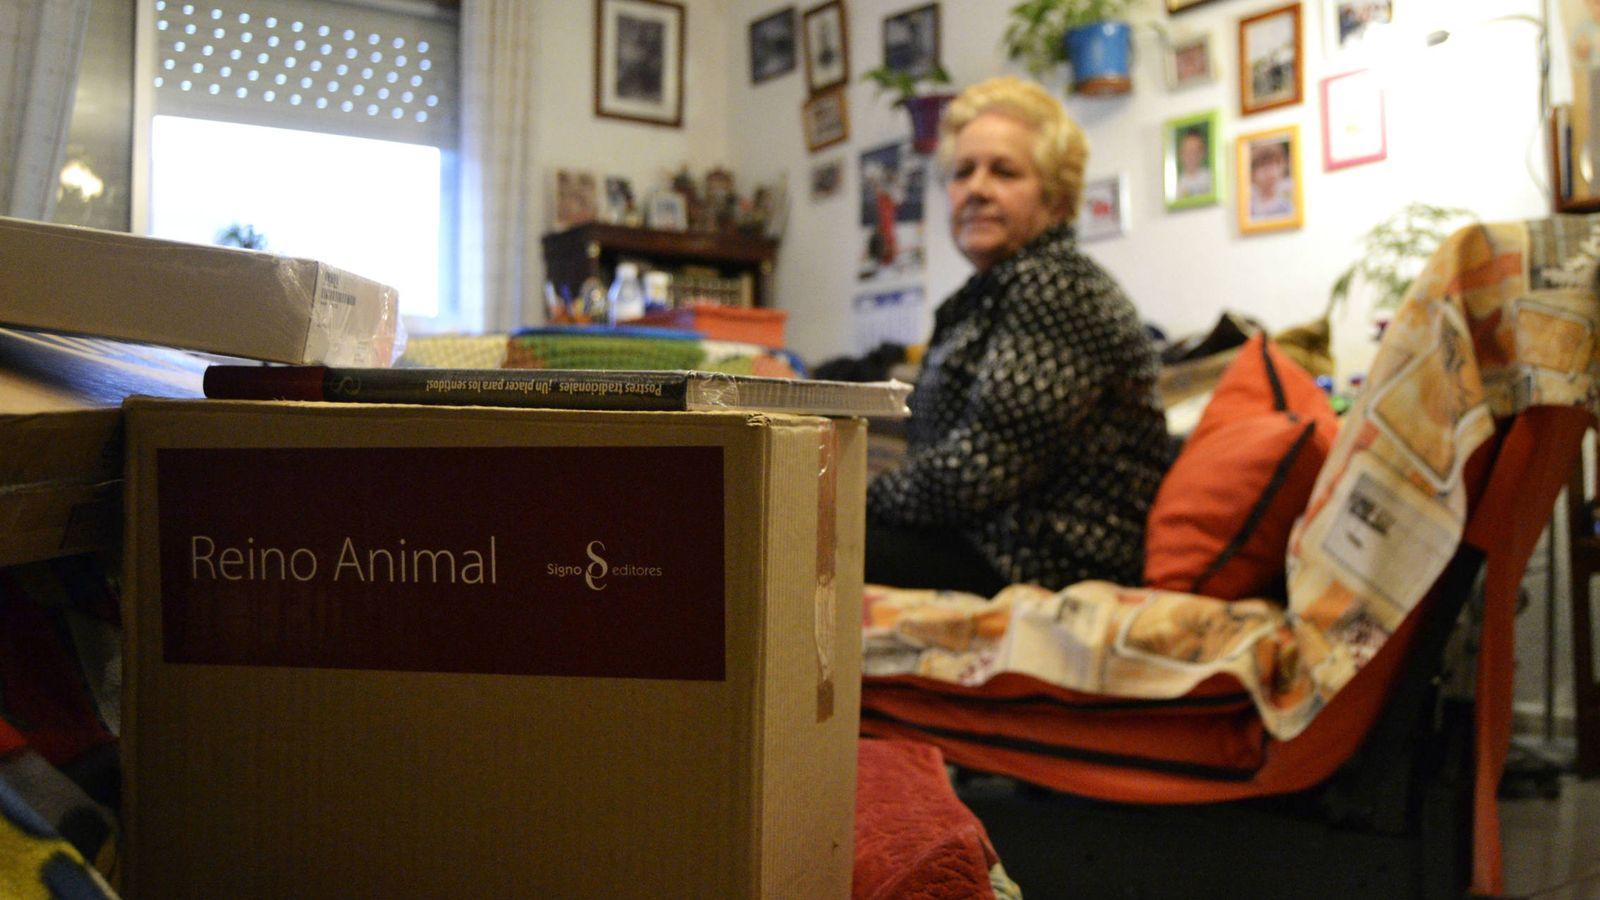 Foto: Balbina, esperando a que recojan los paquetes que compró. (M. Z.)